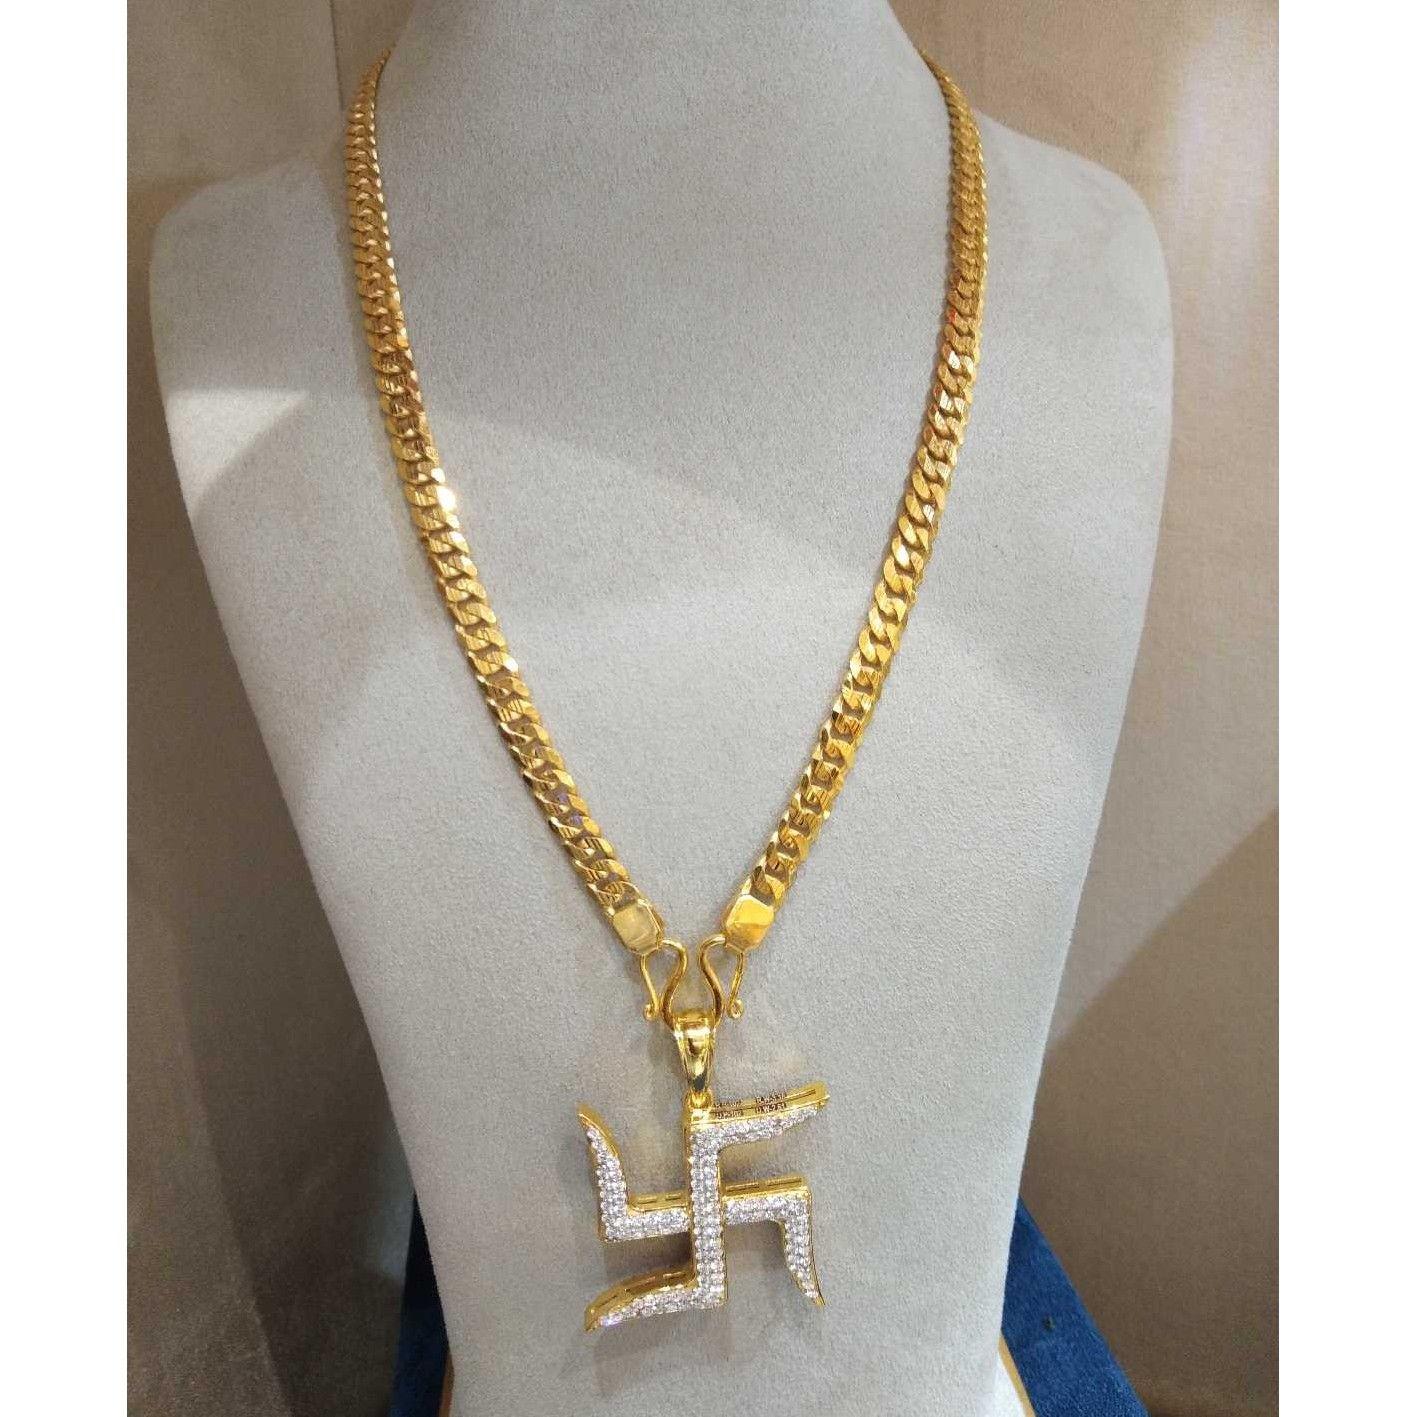 Gold chain & pendant